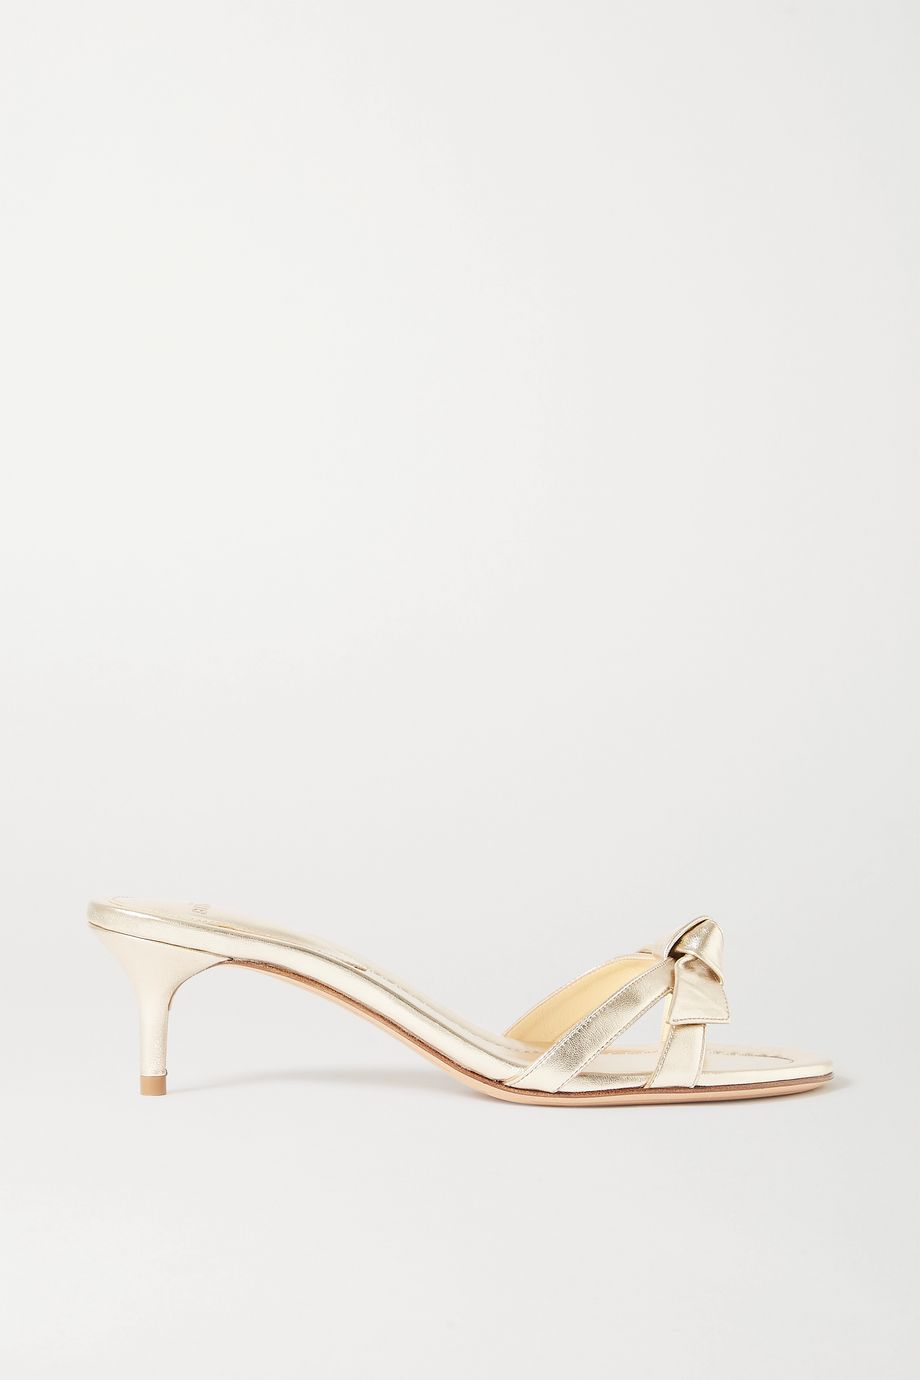 Alexandre Birman Clarita bow-embellished metallic leather mules